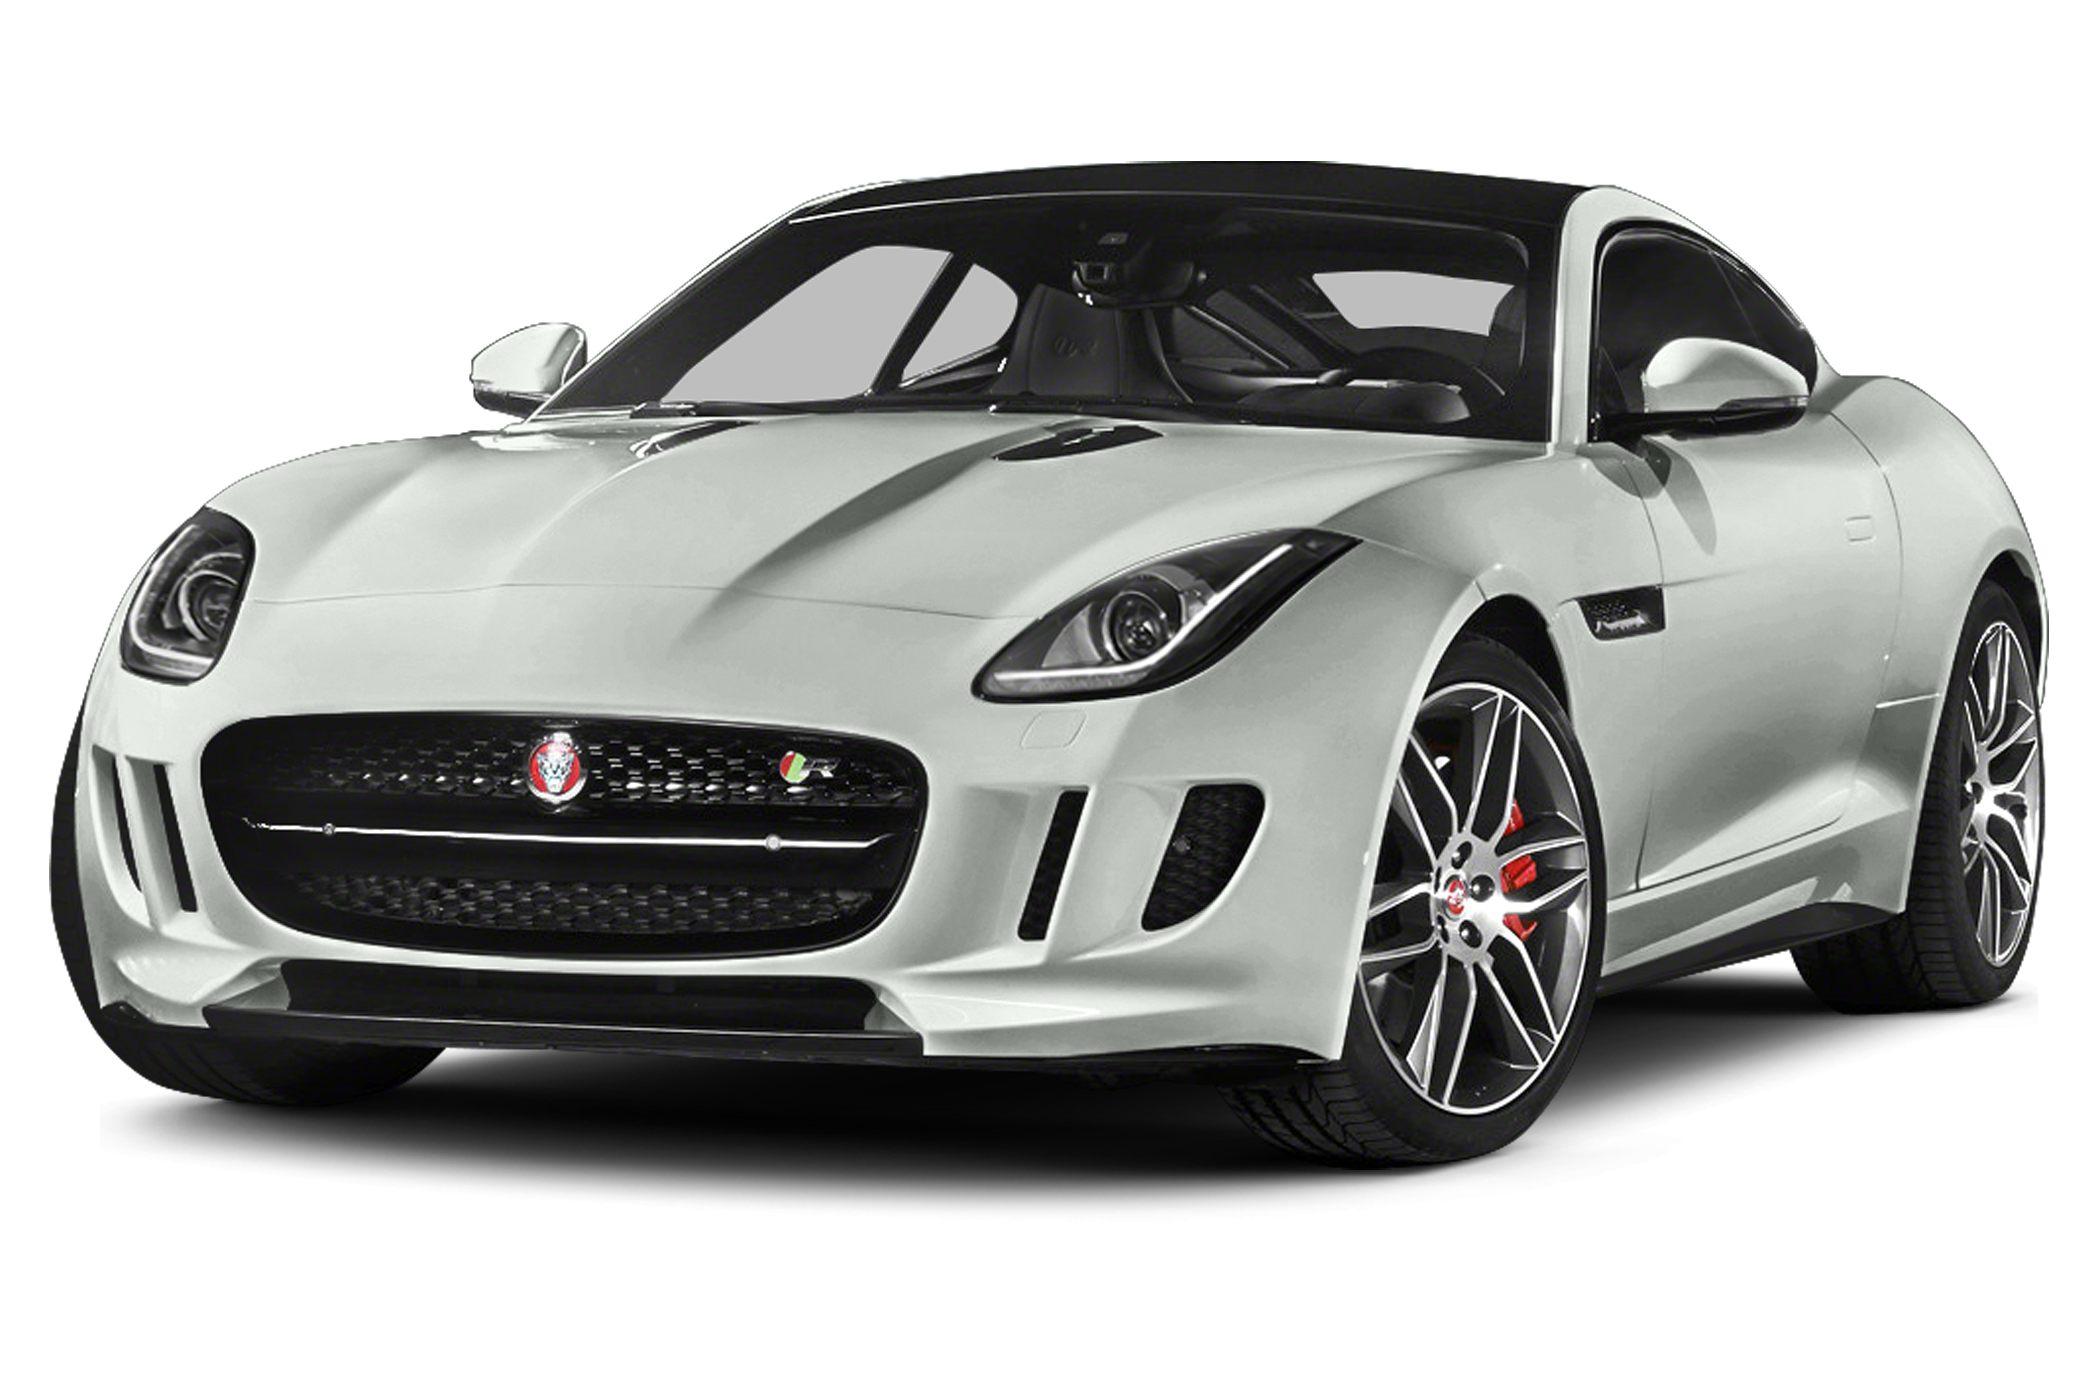 2015 Jaguar F-TYPE